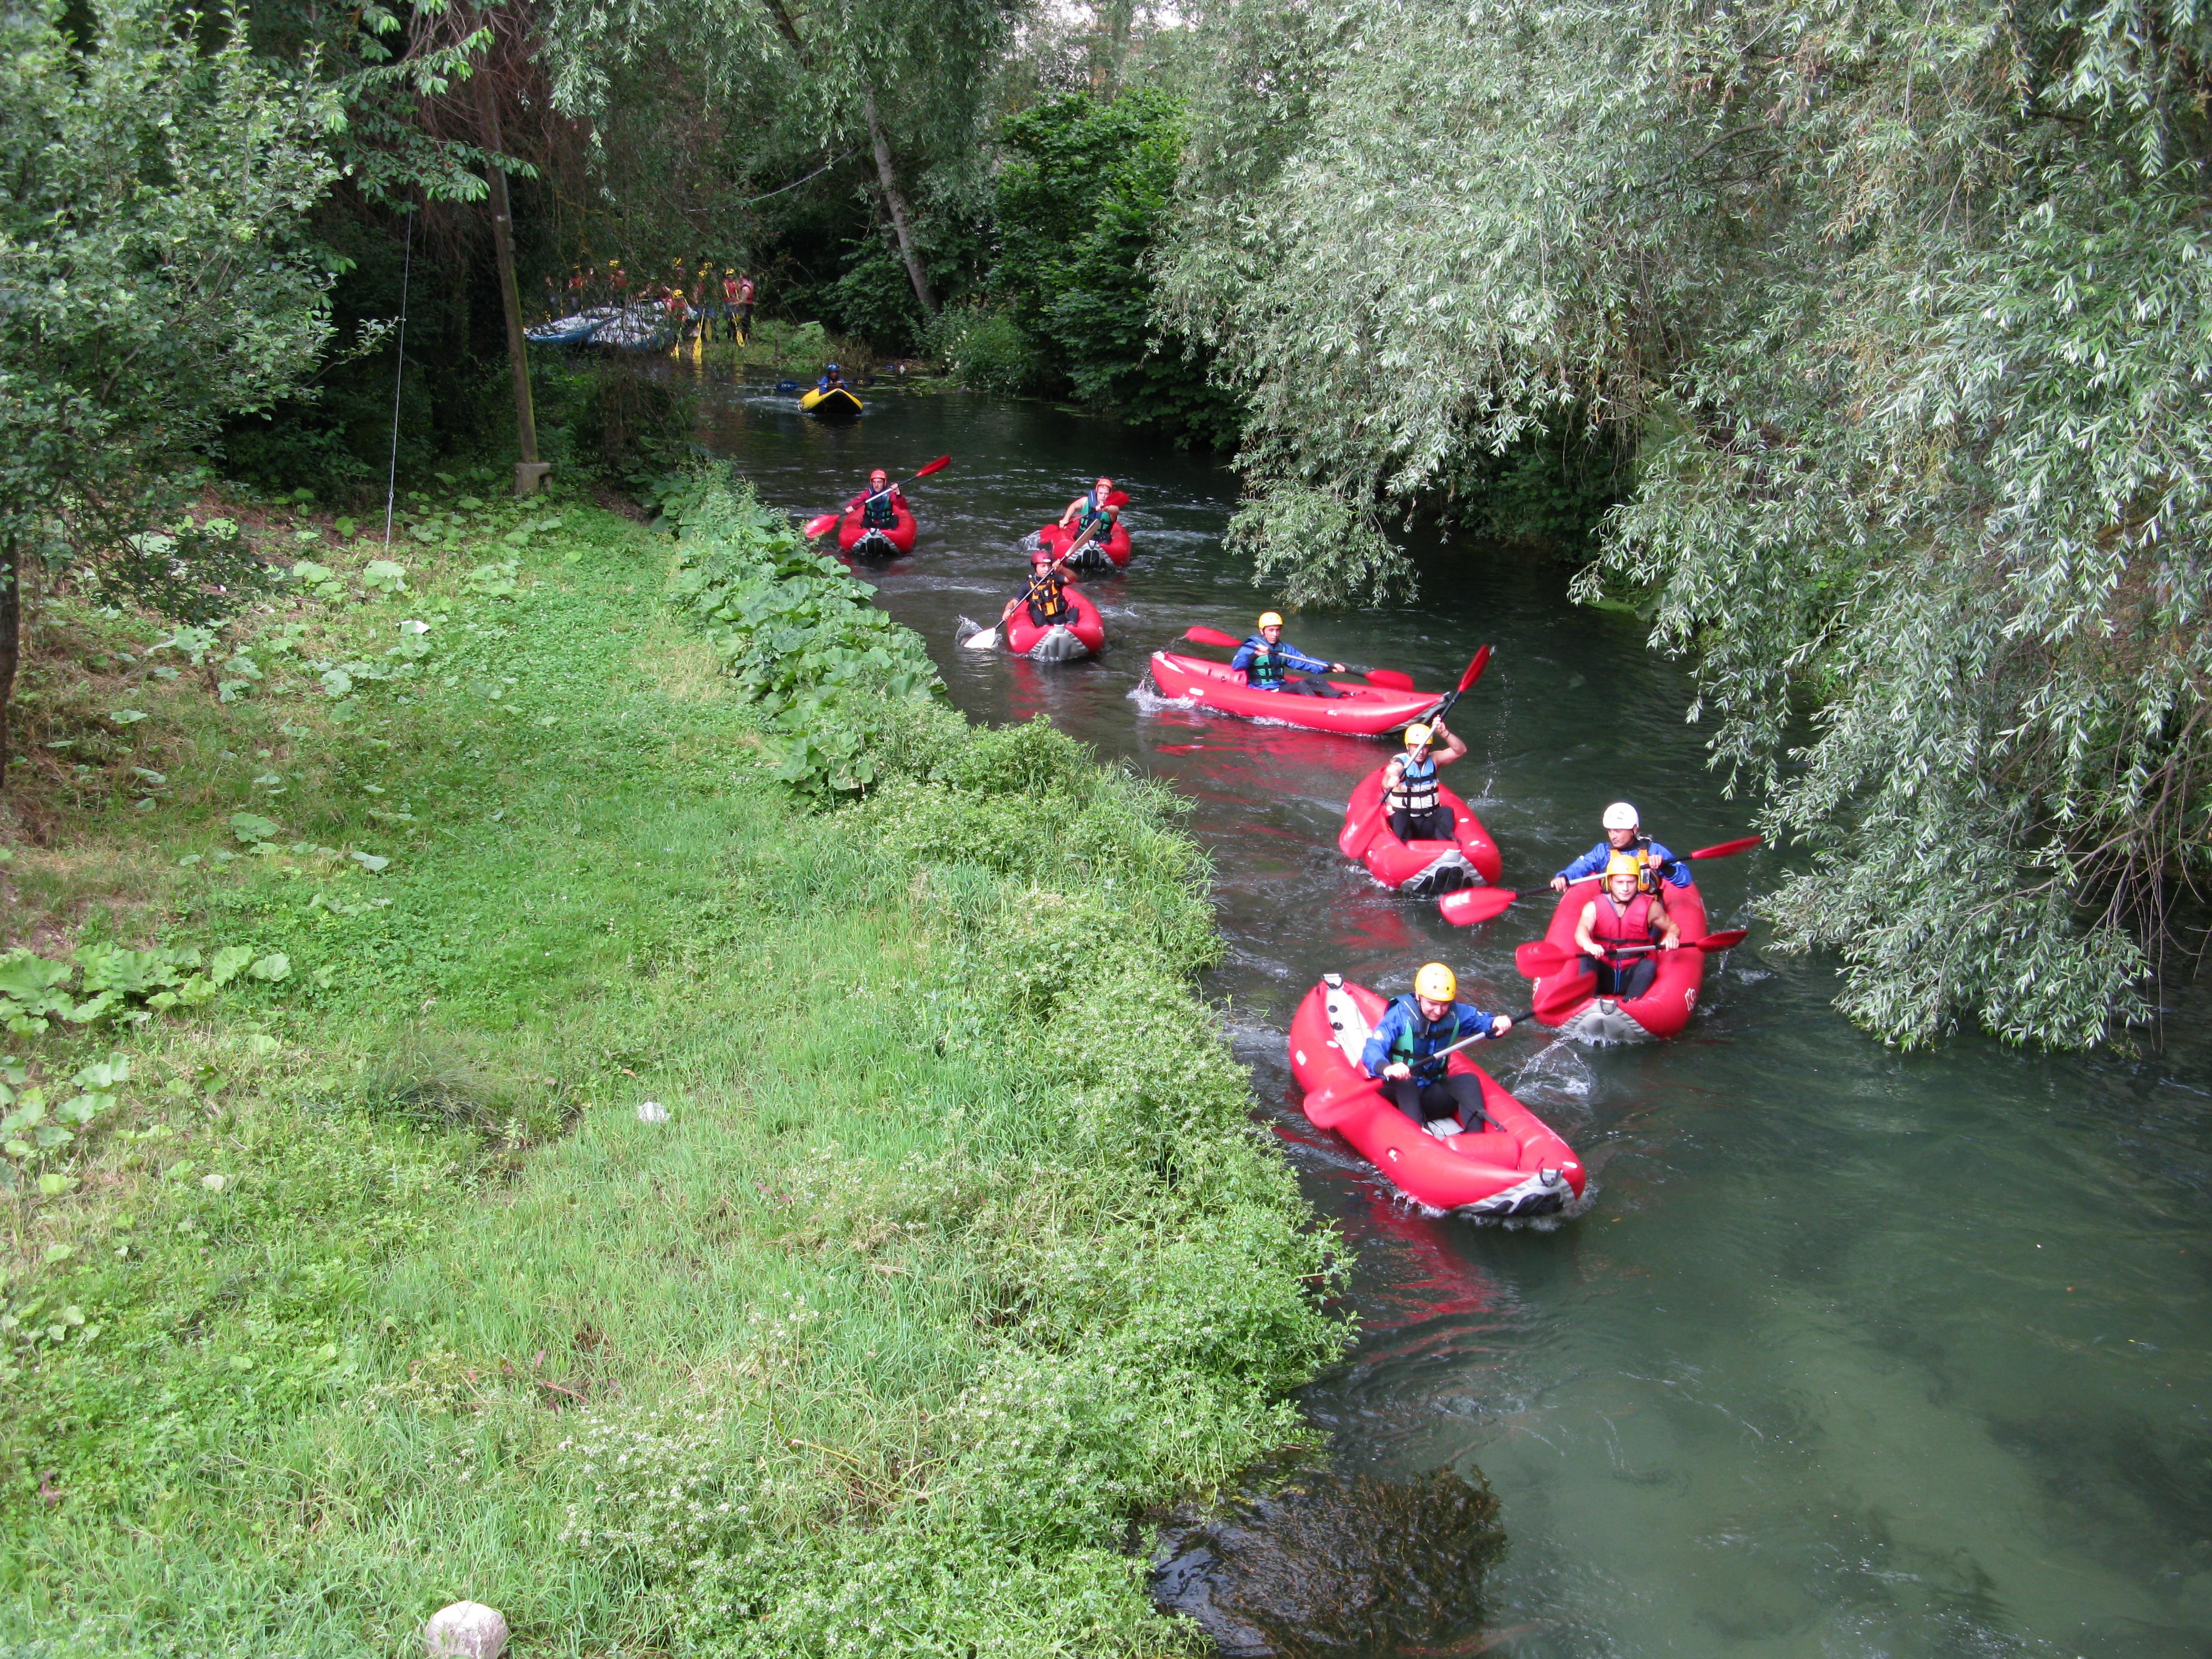 Sport acquatici in Valnerina